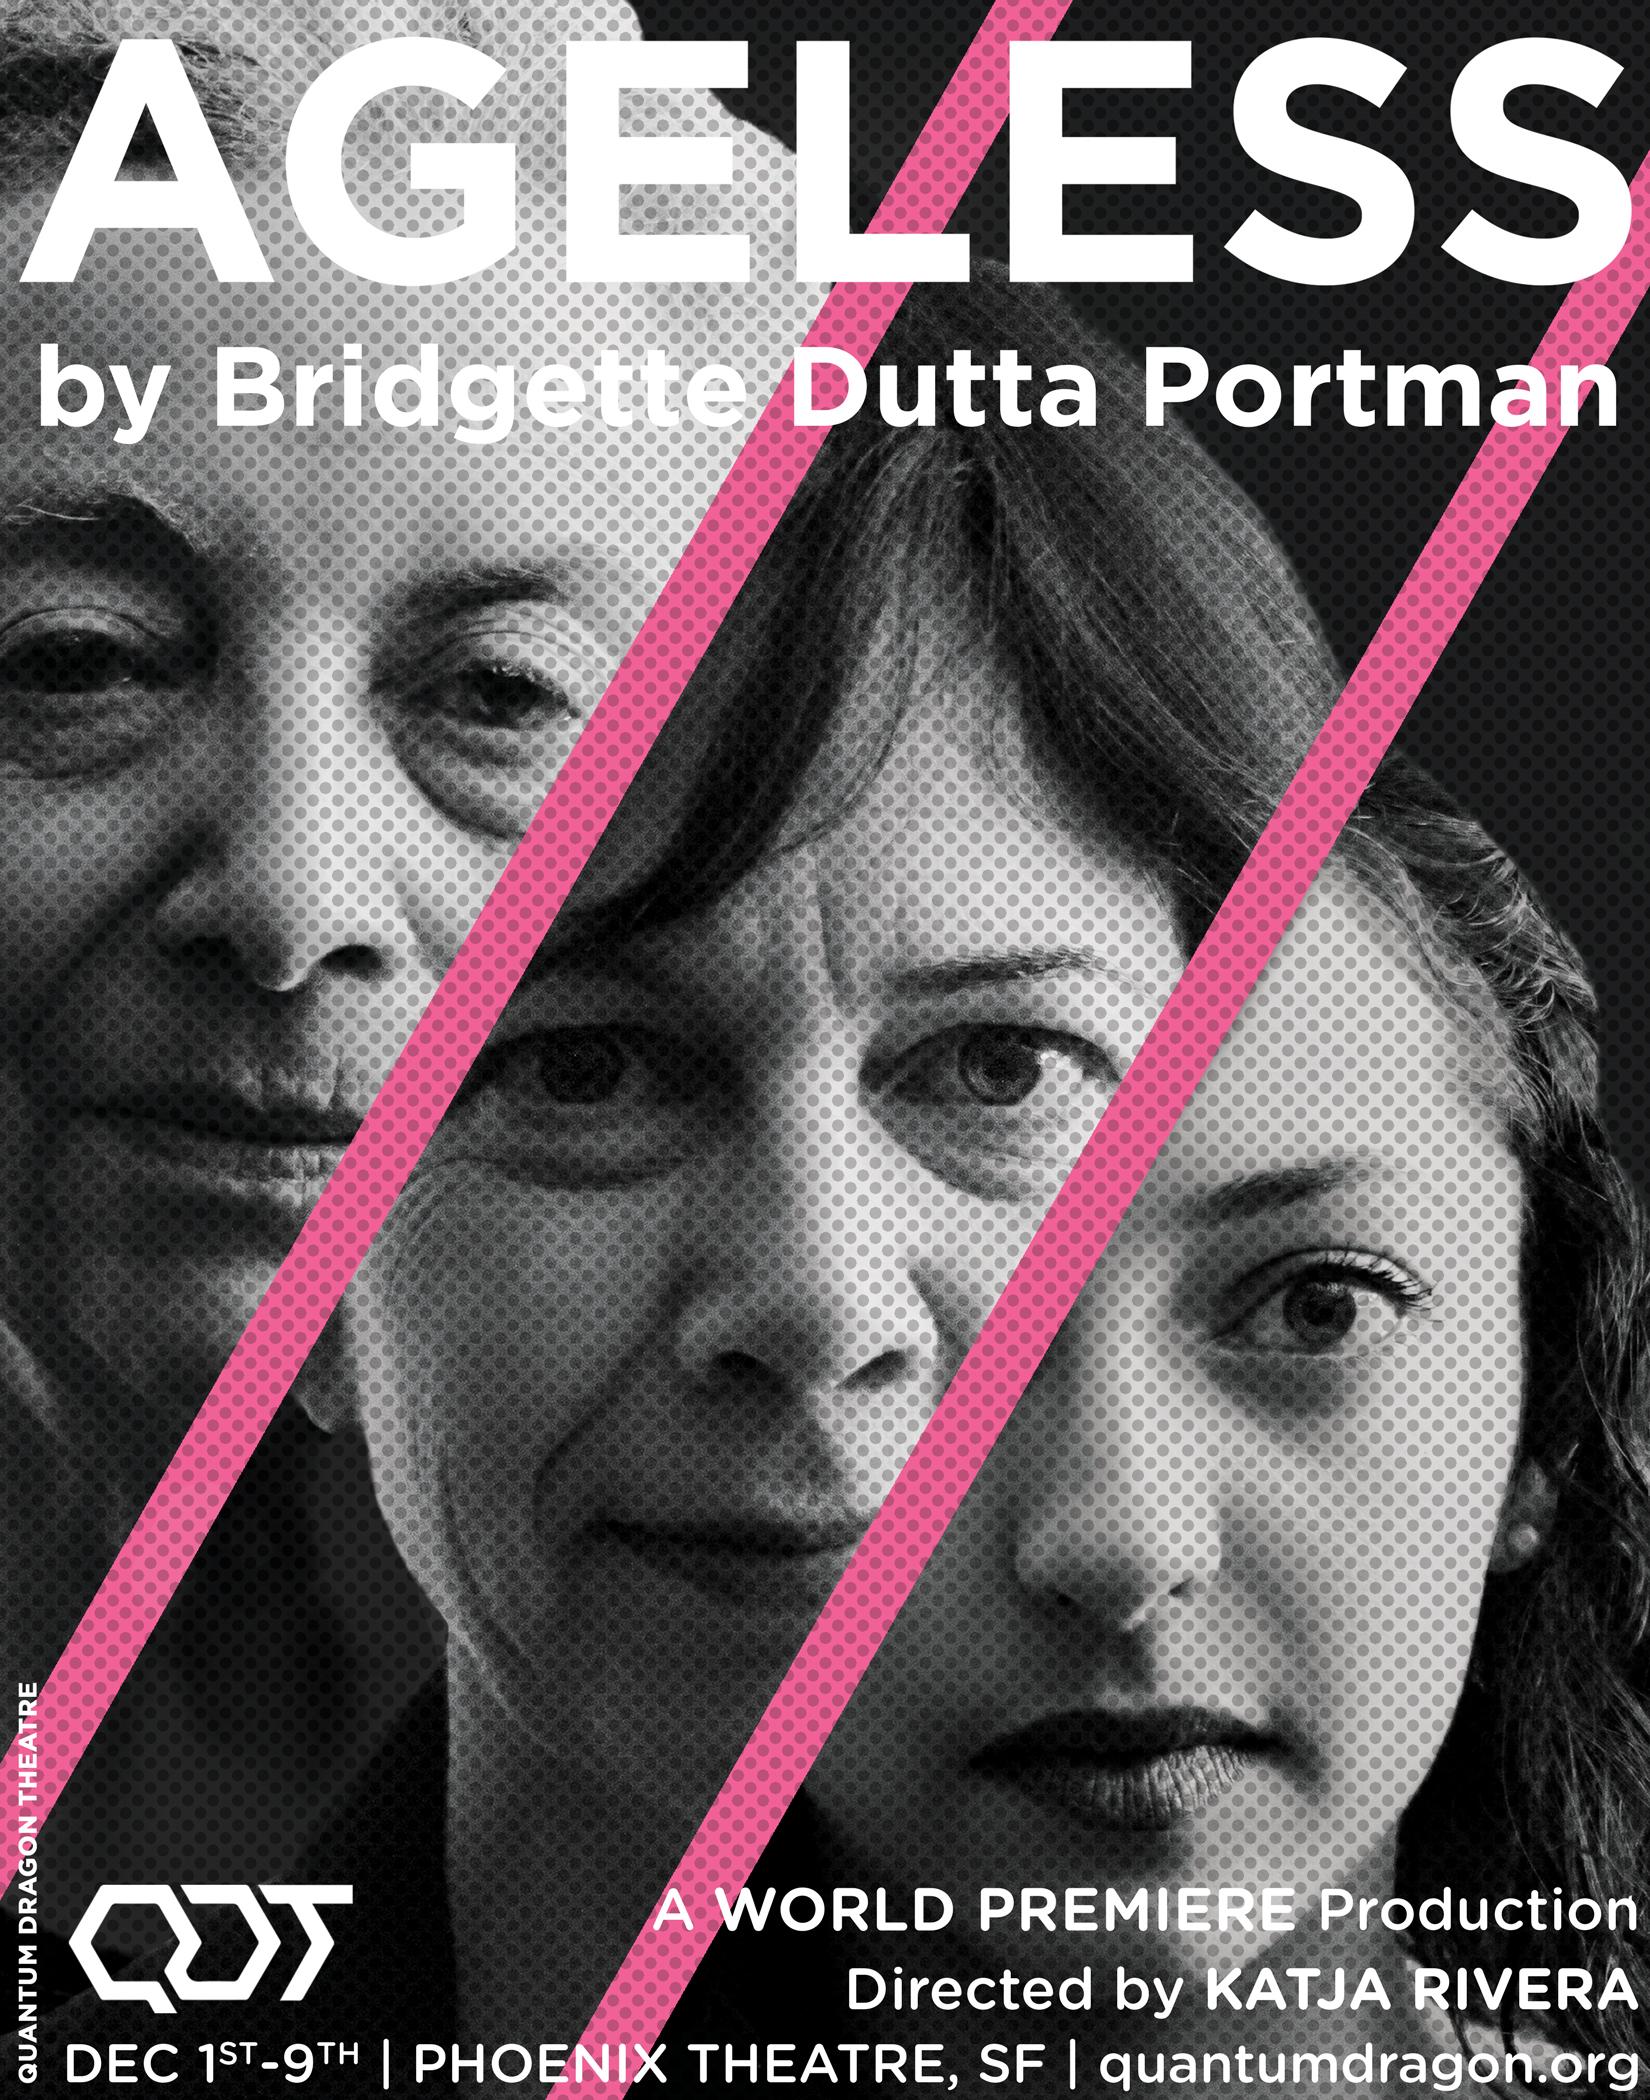 Ageless - OR, THE REVOLT OF THE FLESHBy Bridgette Dutta PortmanDirected by Katja RiveraDECEMBER 1st—9th, 2017The Phoenix Theatre414 Mason Street, SF